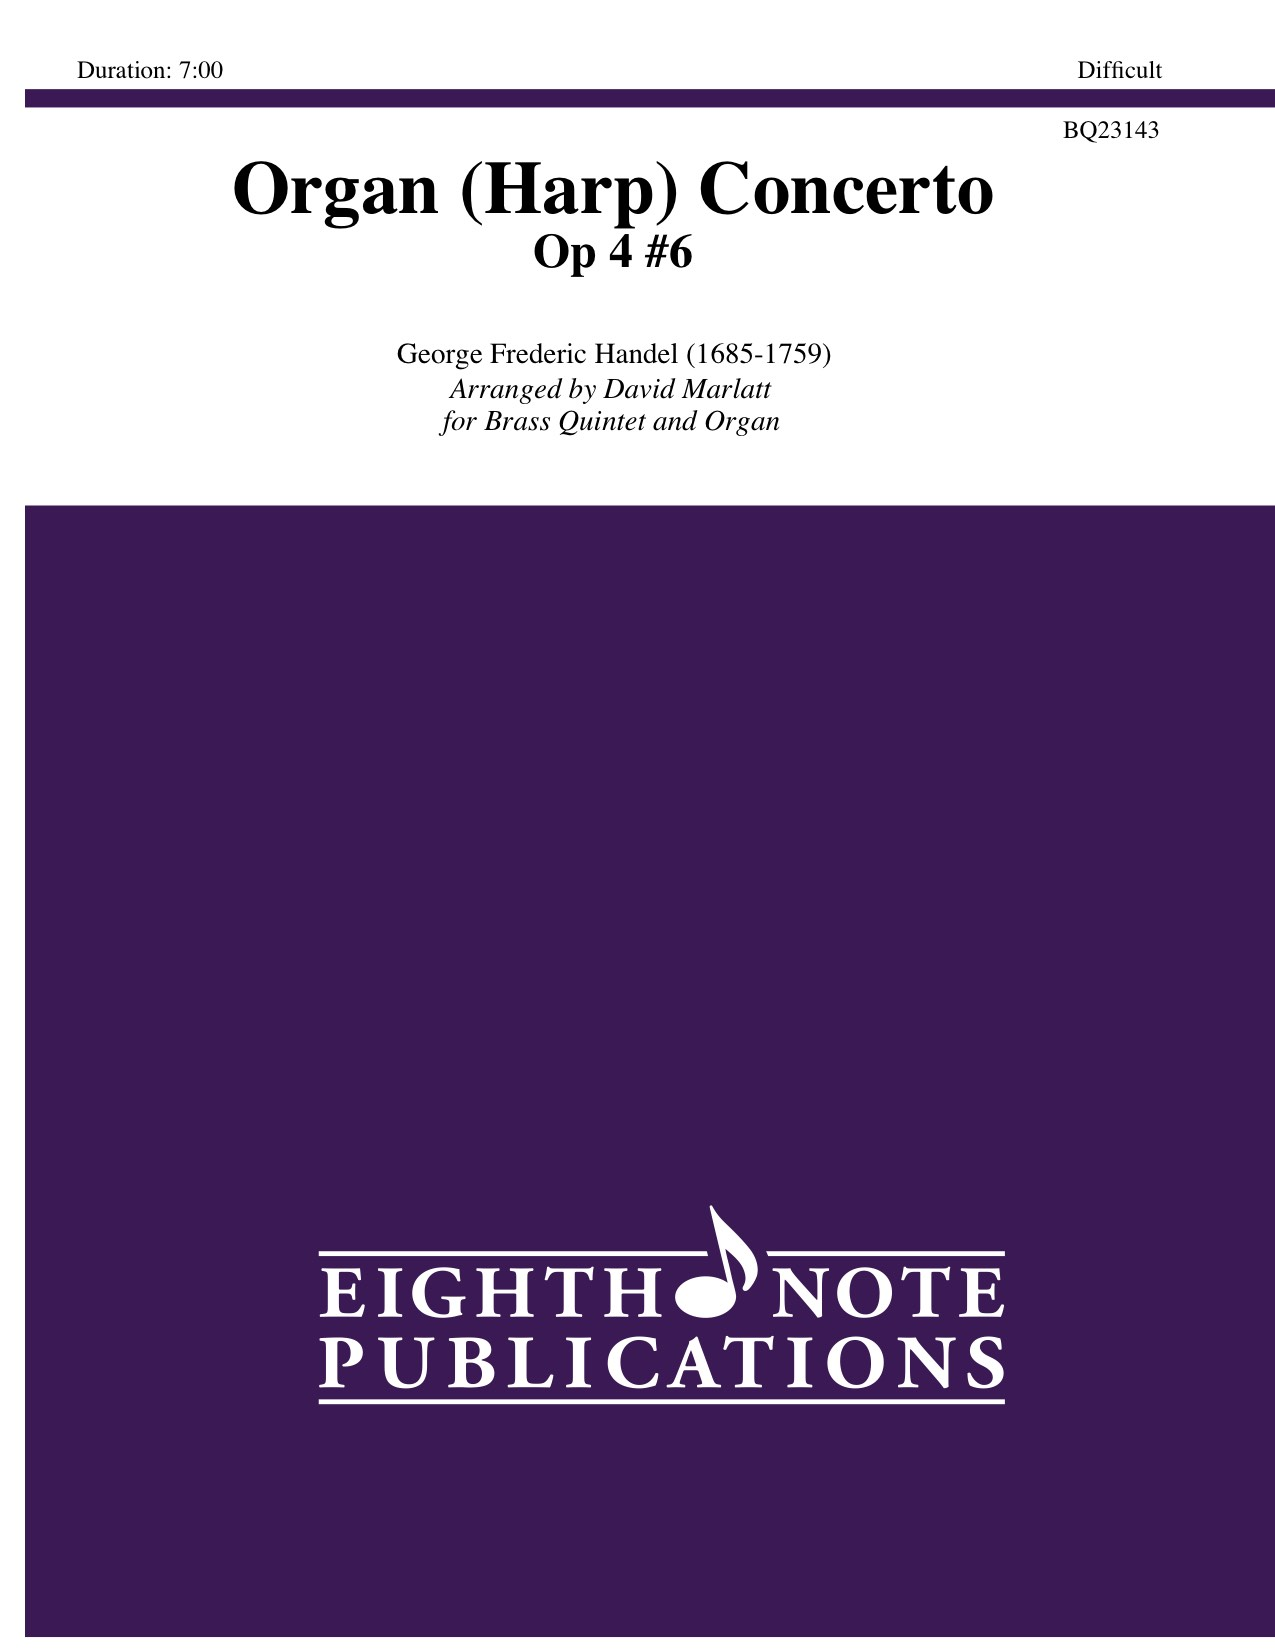 Organ (Harp) Concerto Op 4 #6 - George Frederic Handel